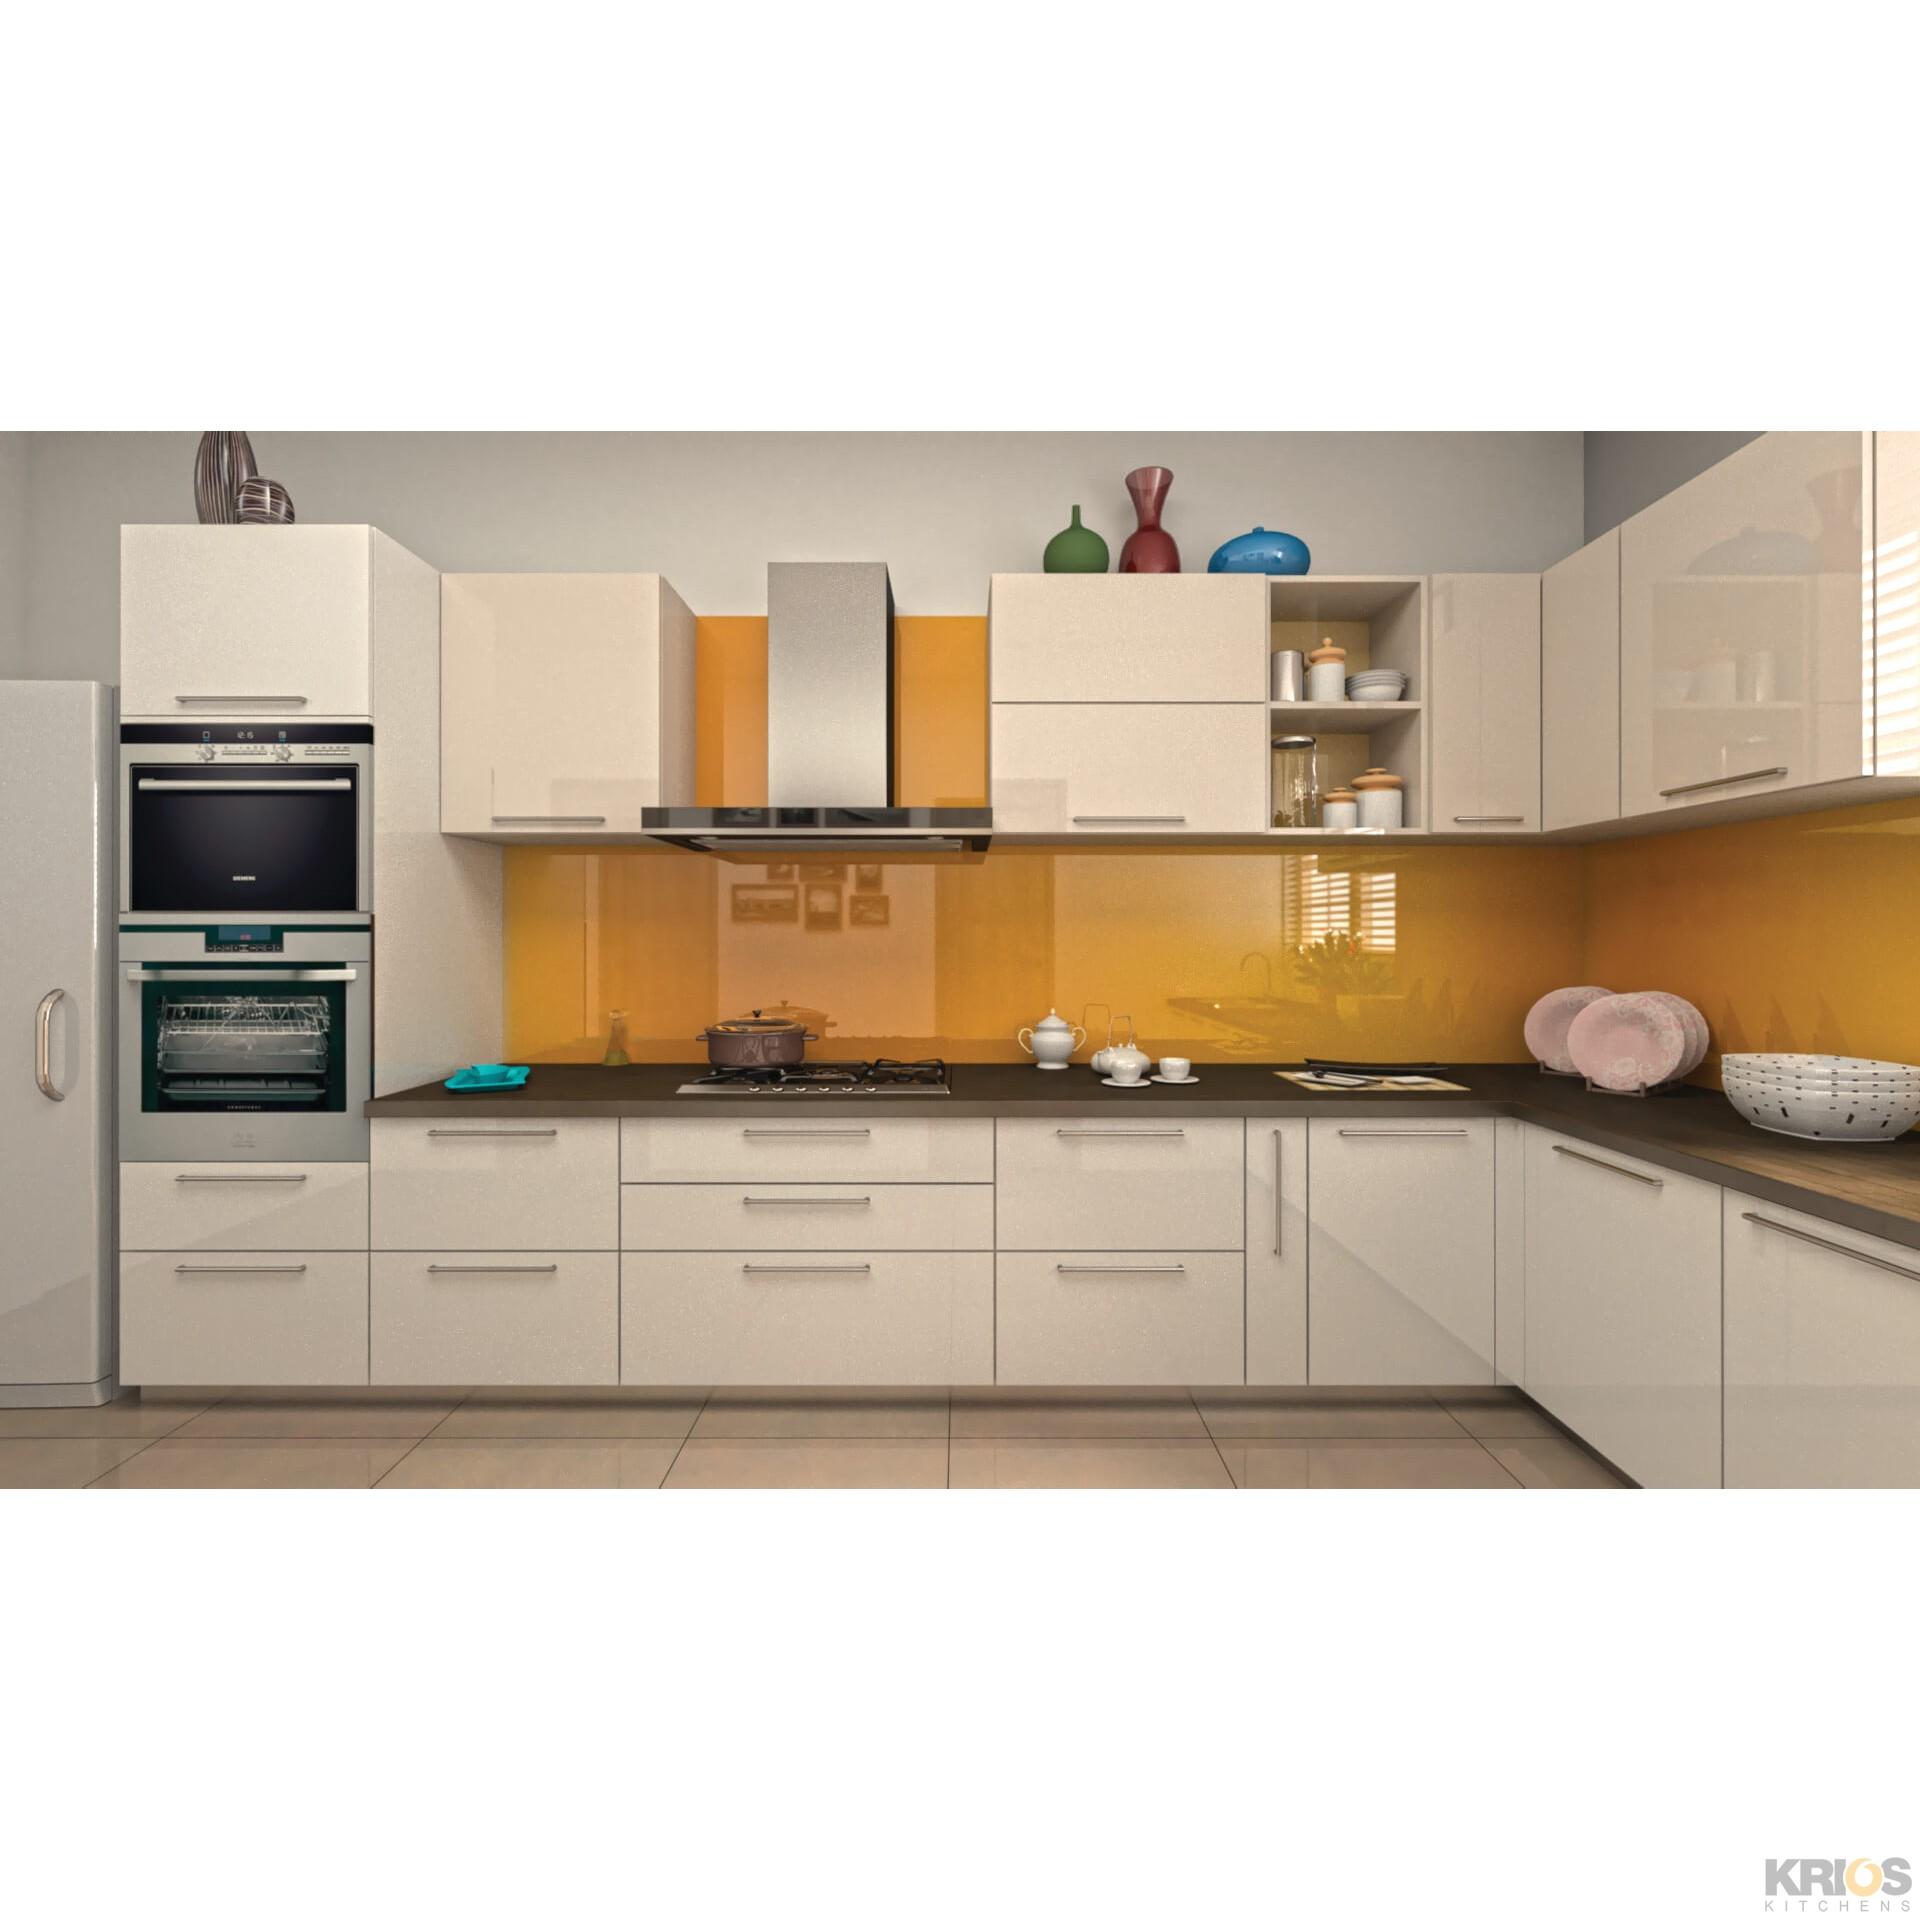 L Shaped Modular Kitchen Designs Catalogue: Alegra White